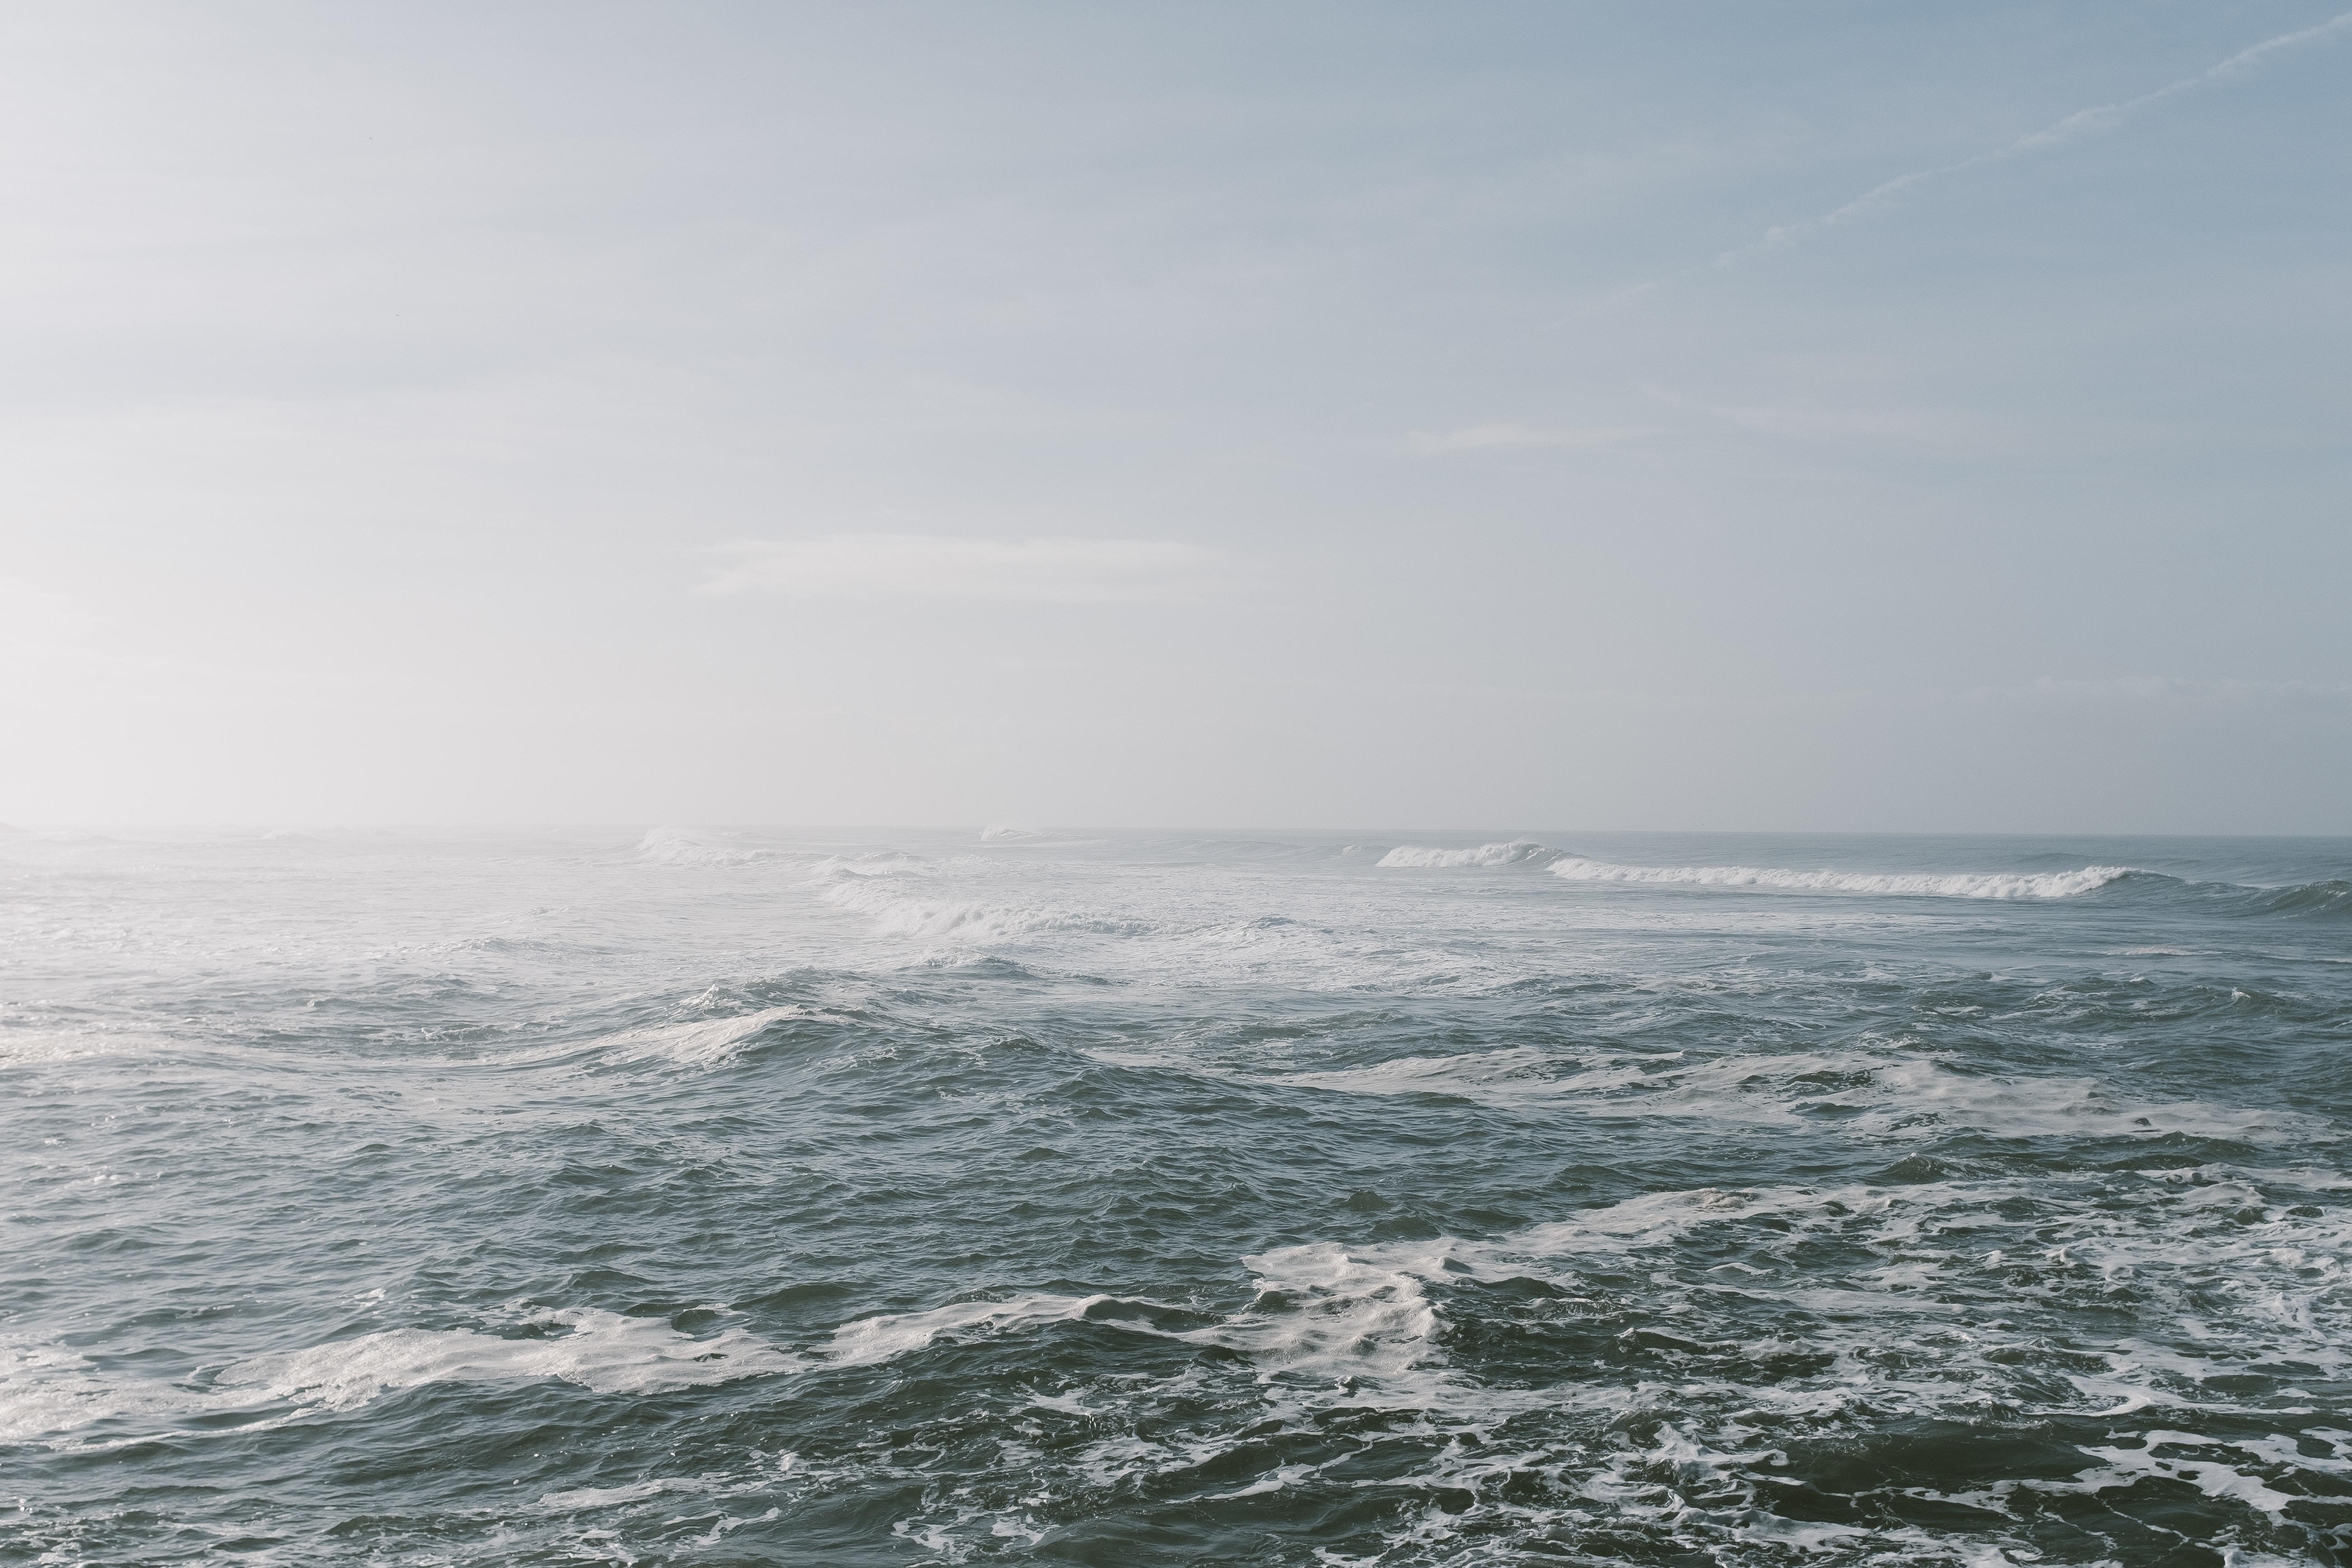 landscape photo of ocean